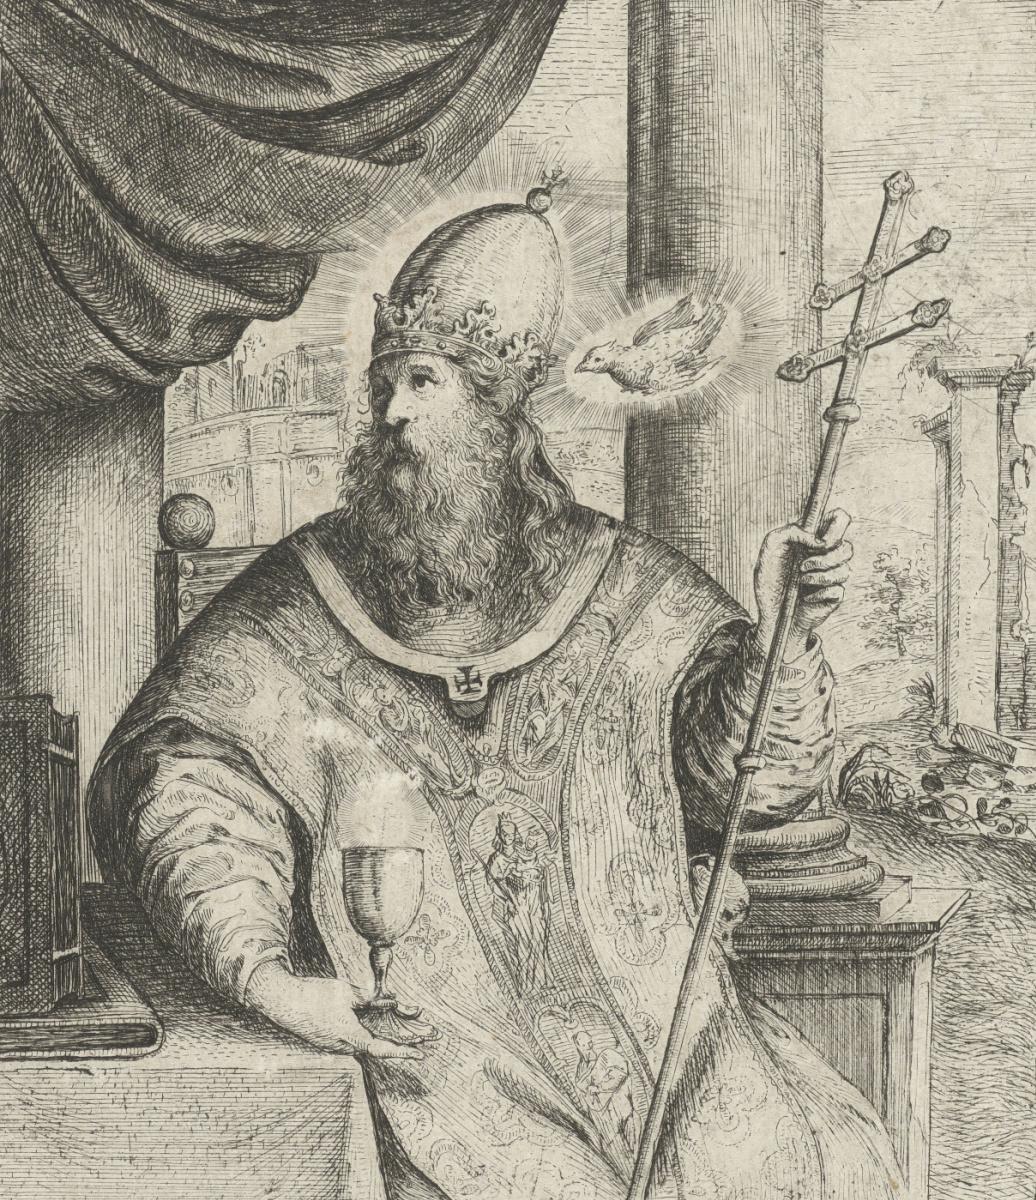 Jan Lievens. The Church father, St. John Chrysostom